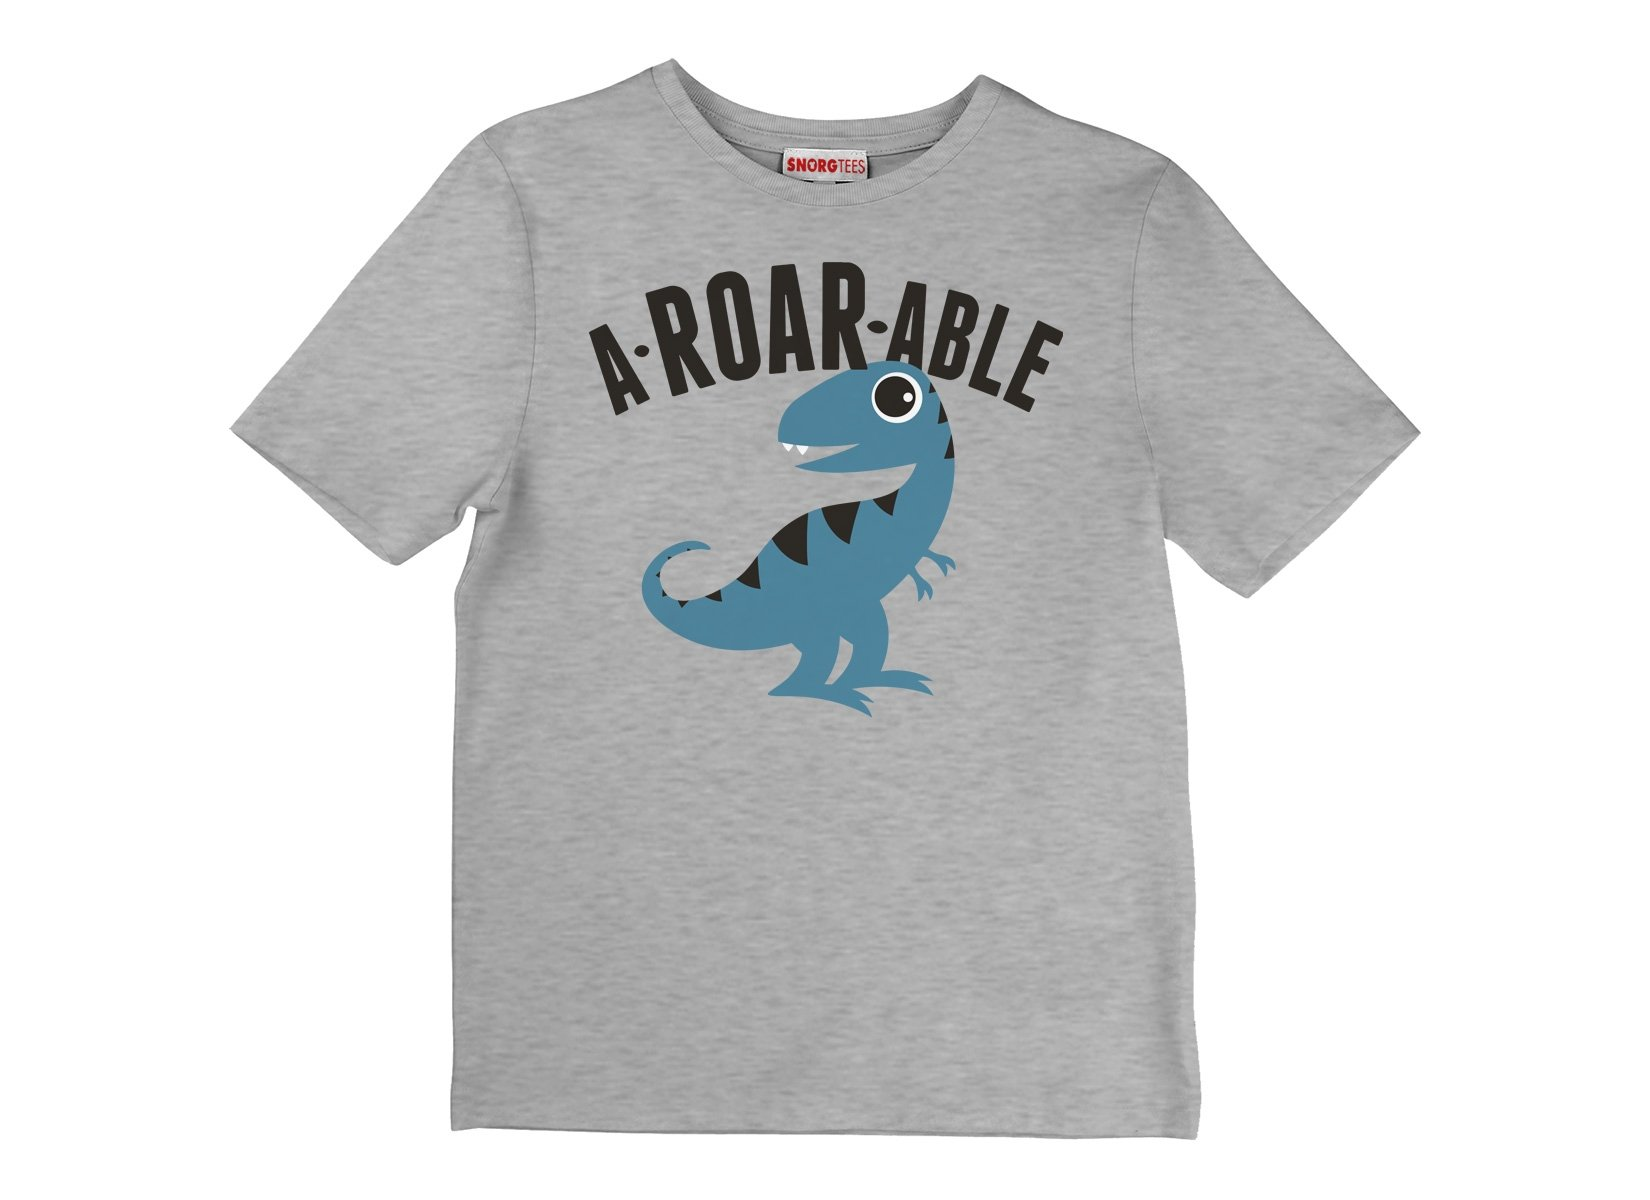 A-Roar-Able on Kids T-Shirt